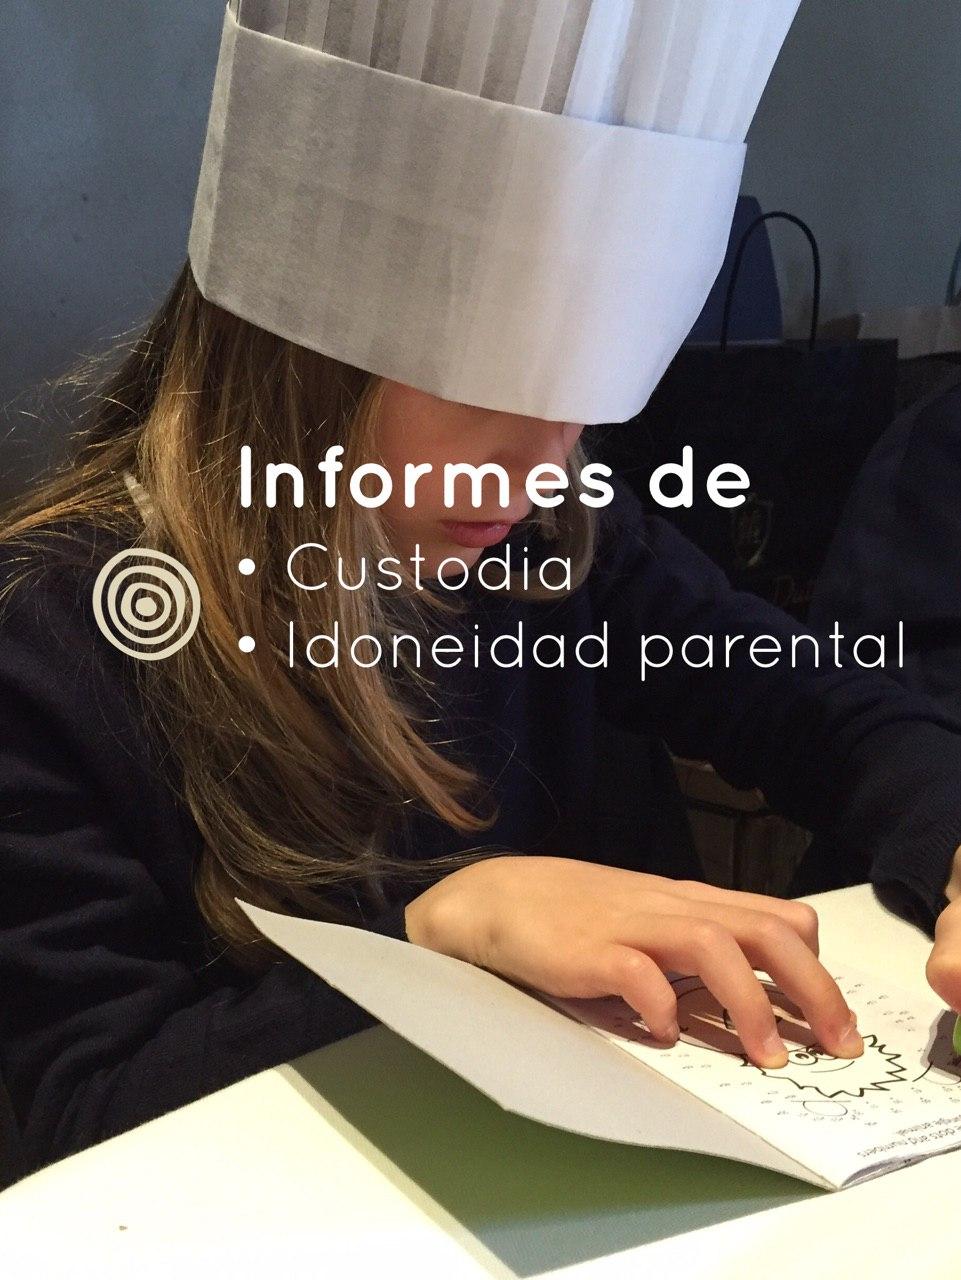 idoneidad parental